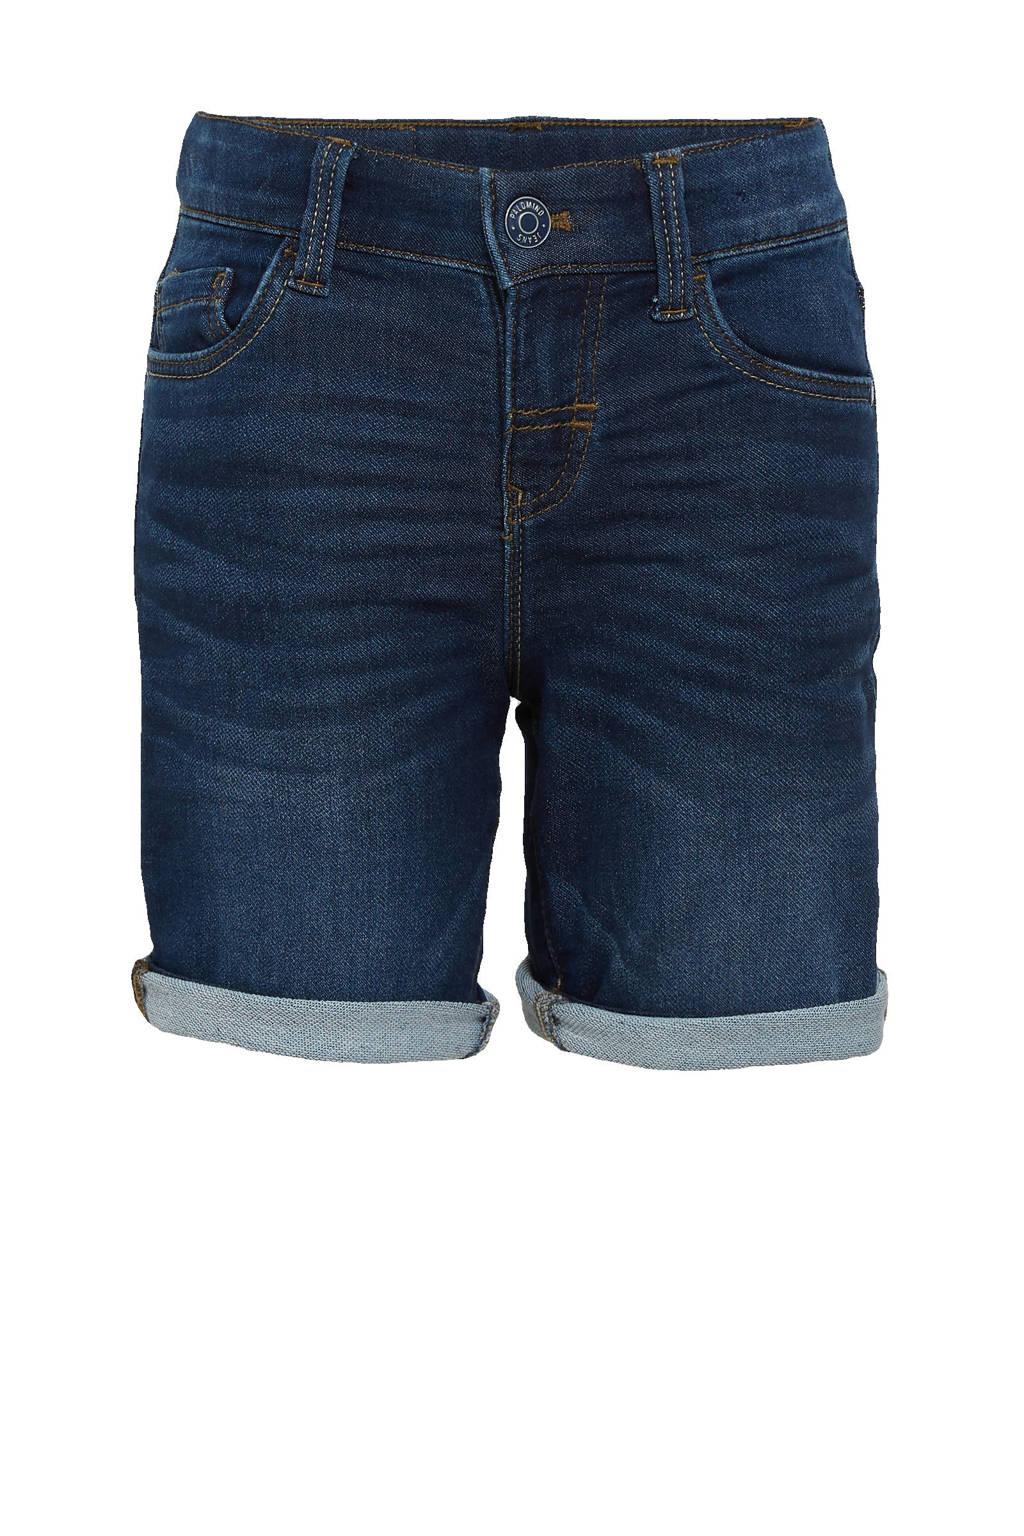 C&A slim fit jeans bermuda donkerblauw, Donkerblauw